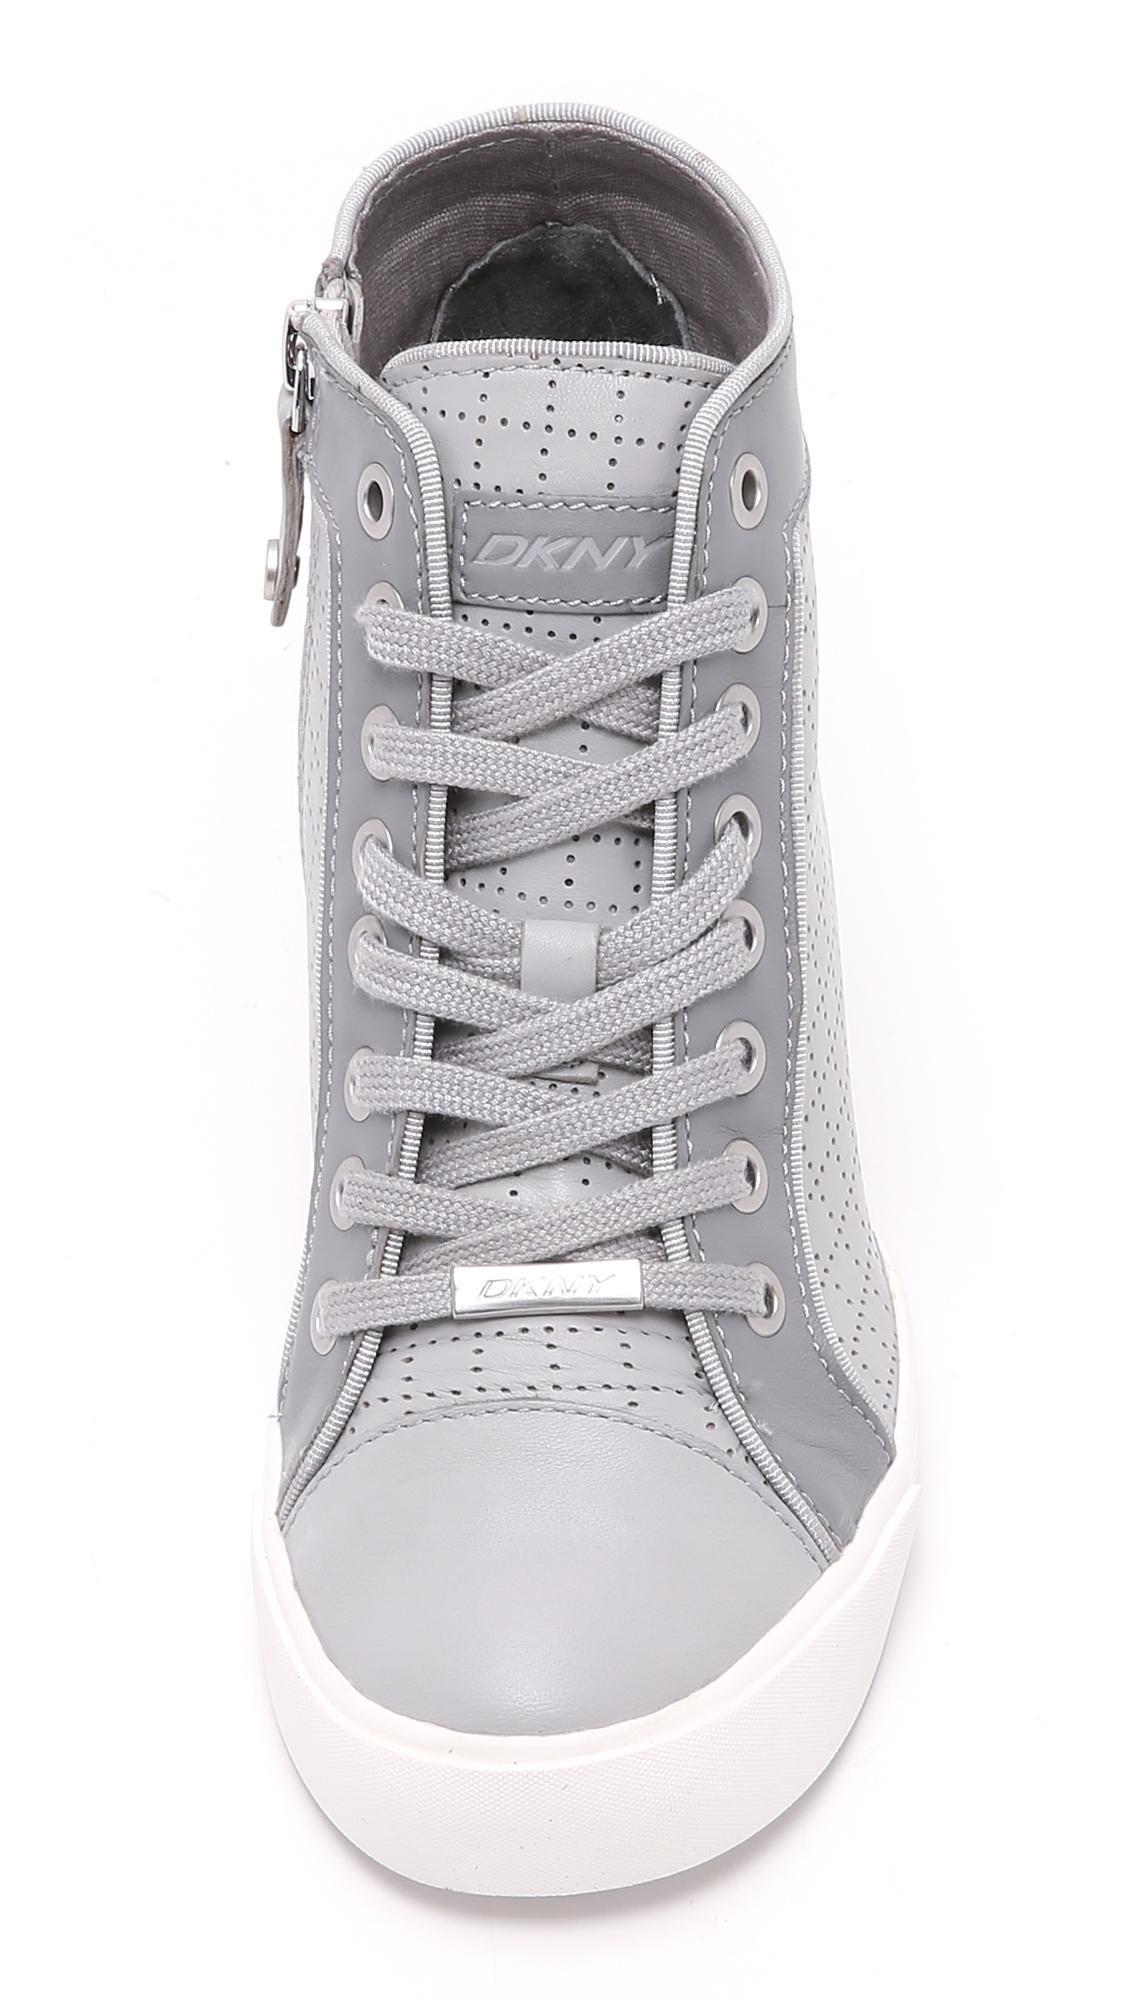 71107123707 Lyst - DKNY Cresta Wedge Sneakers in Gray